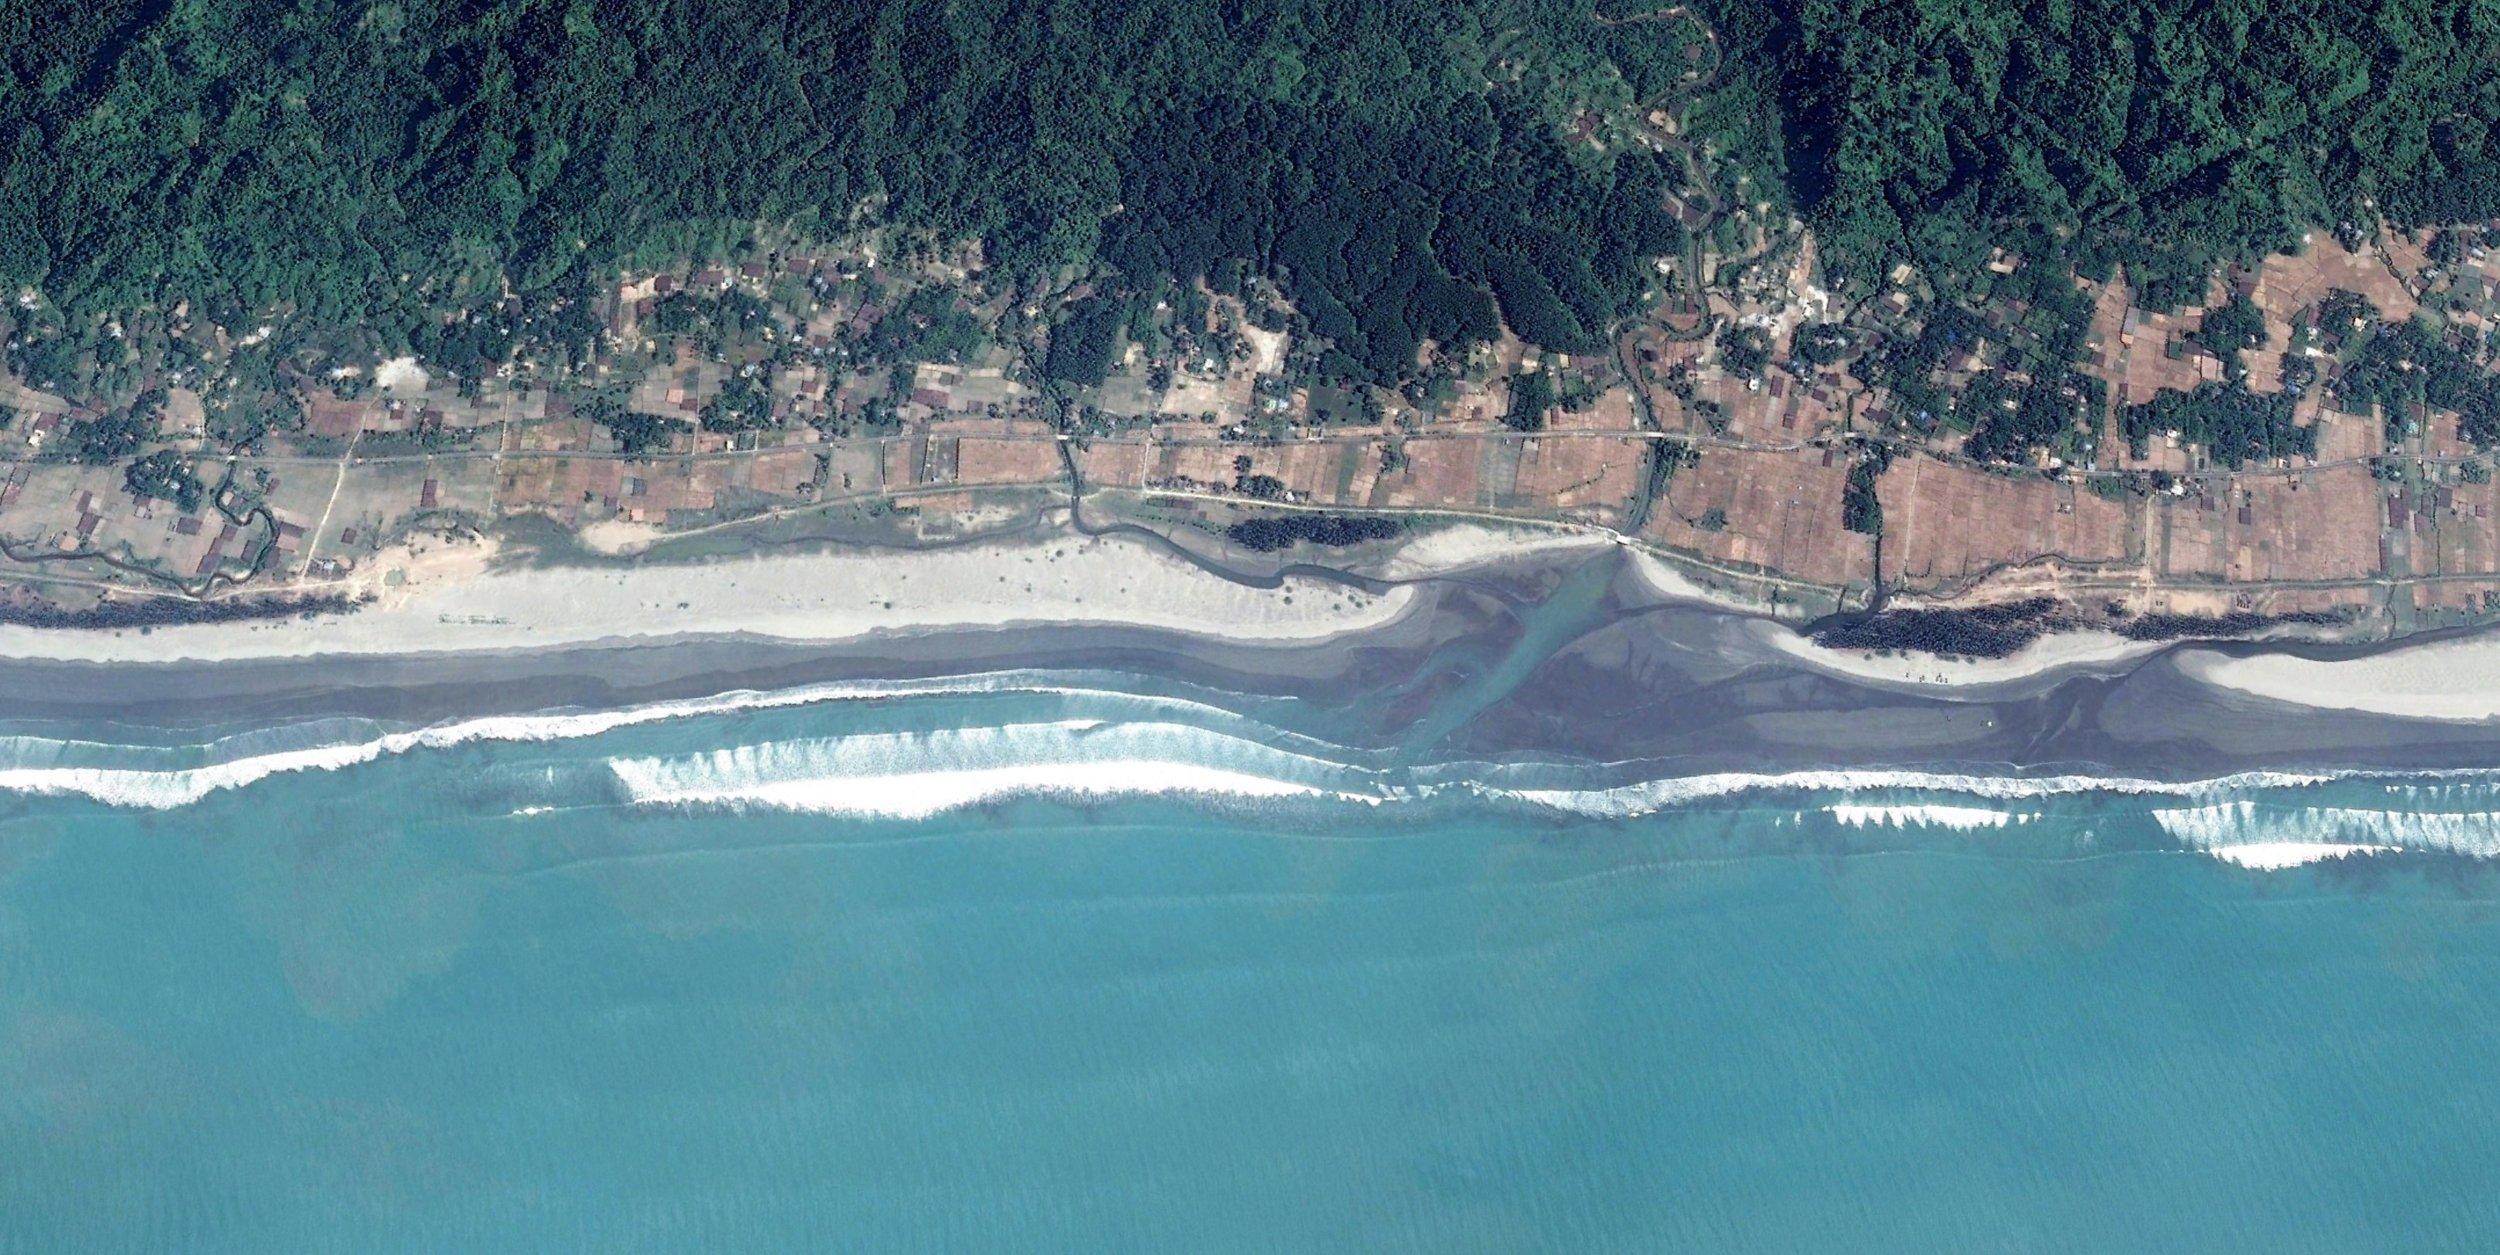 Inani beach (beach length: 14 km.)